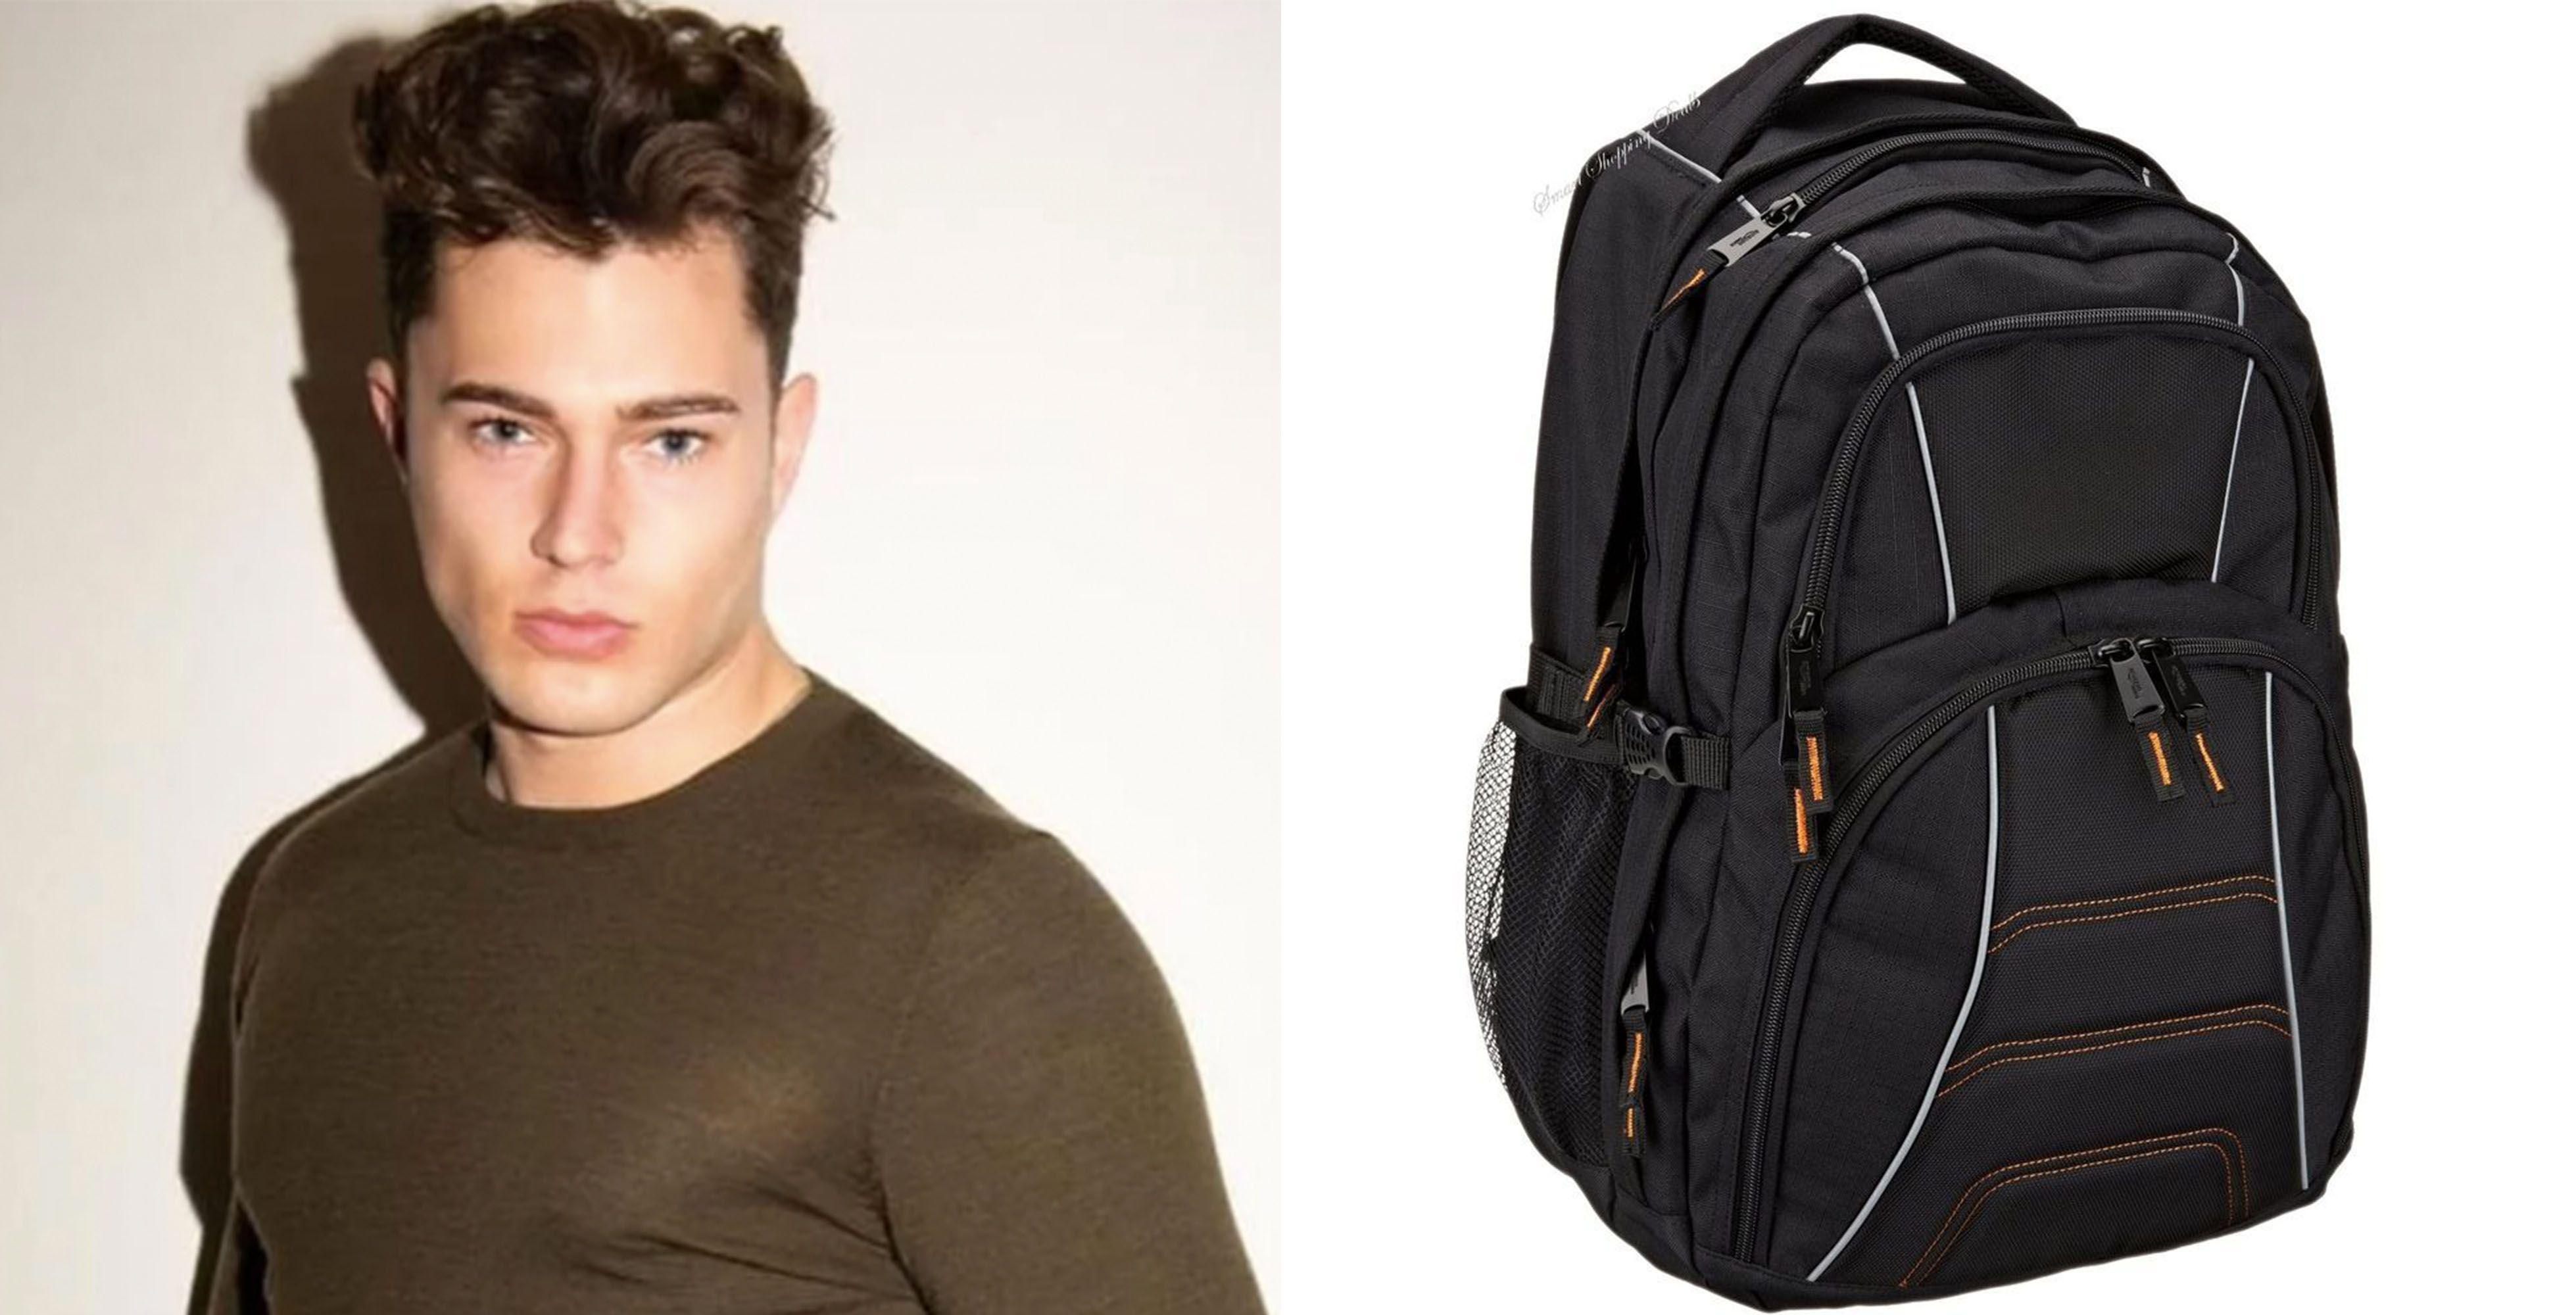 Image may contain: Human, Person, Backpack, Bag